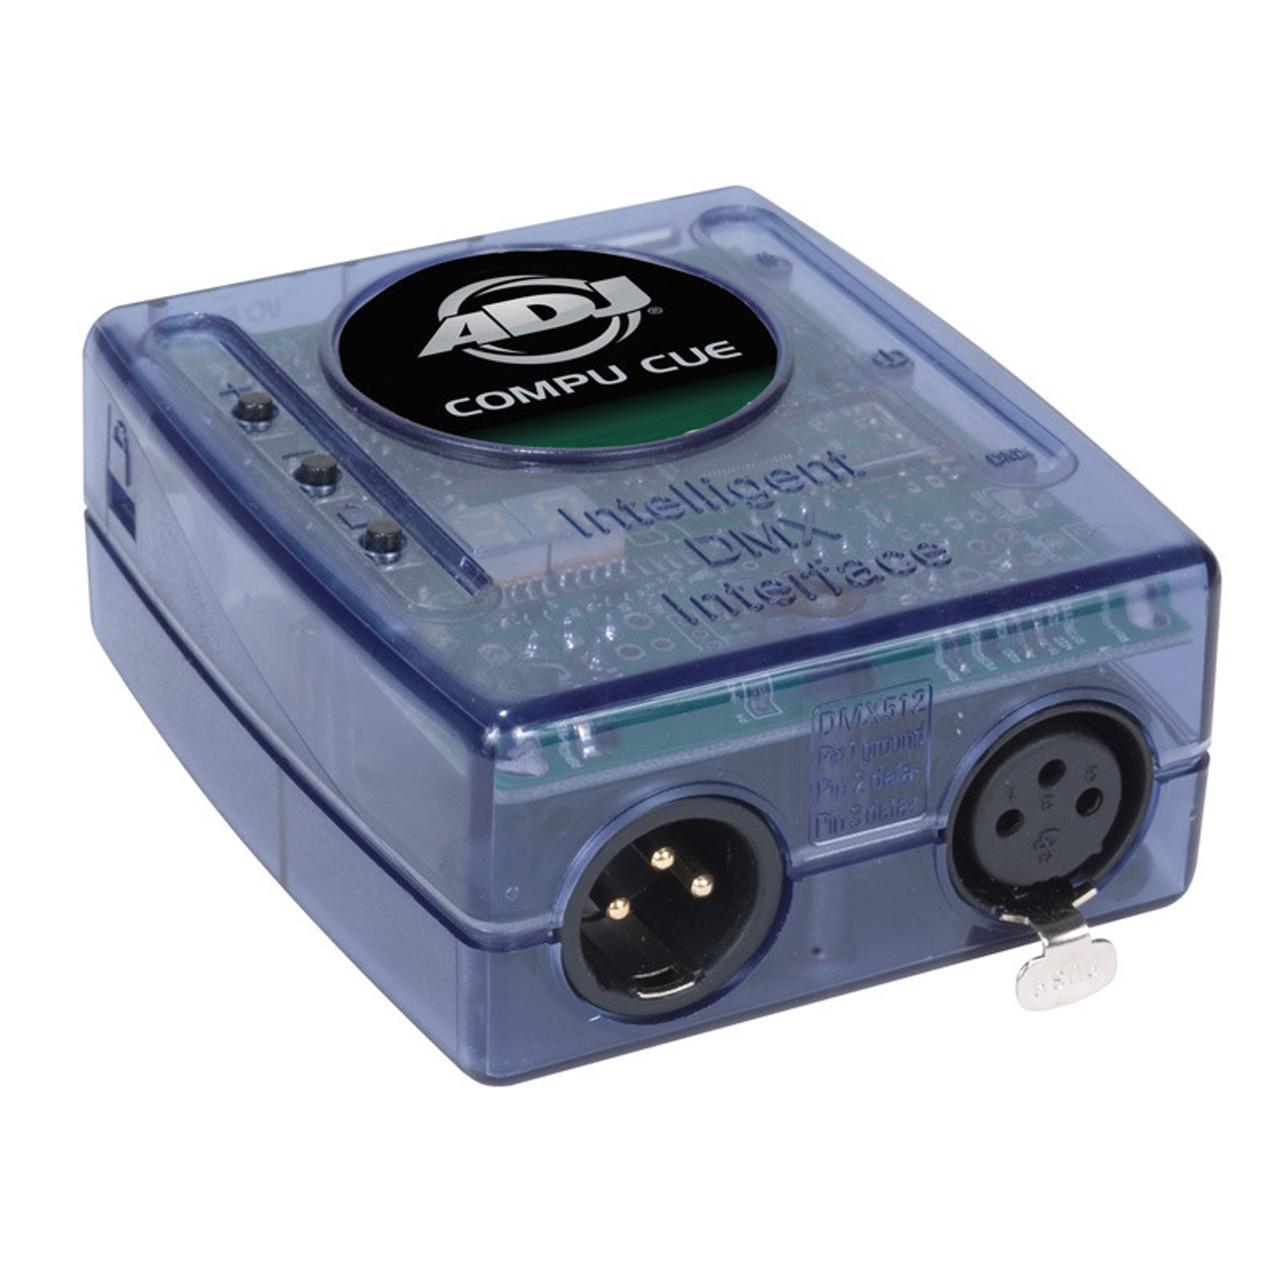 American DJ COM523 - COMPU CUE 32/64 bit DMX interface  PC DMX Control  Software with 2 universes of DMX control plus 2 universes of Art-Net control